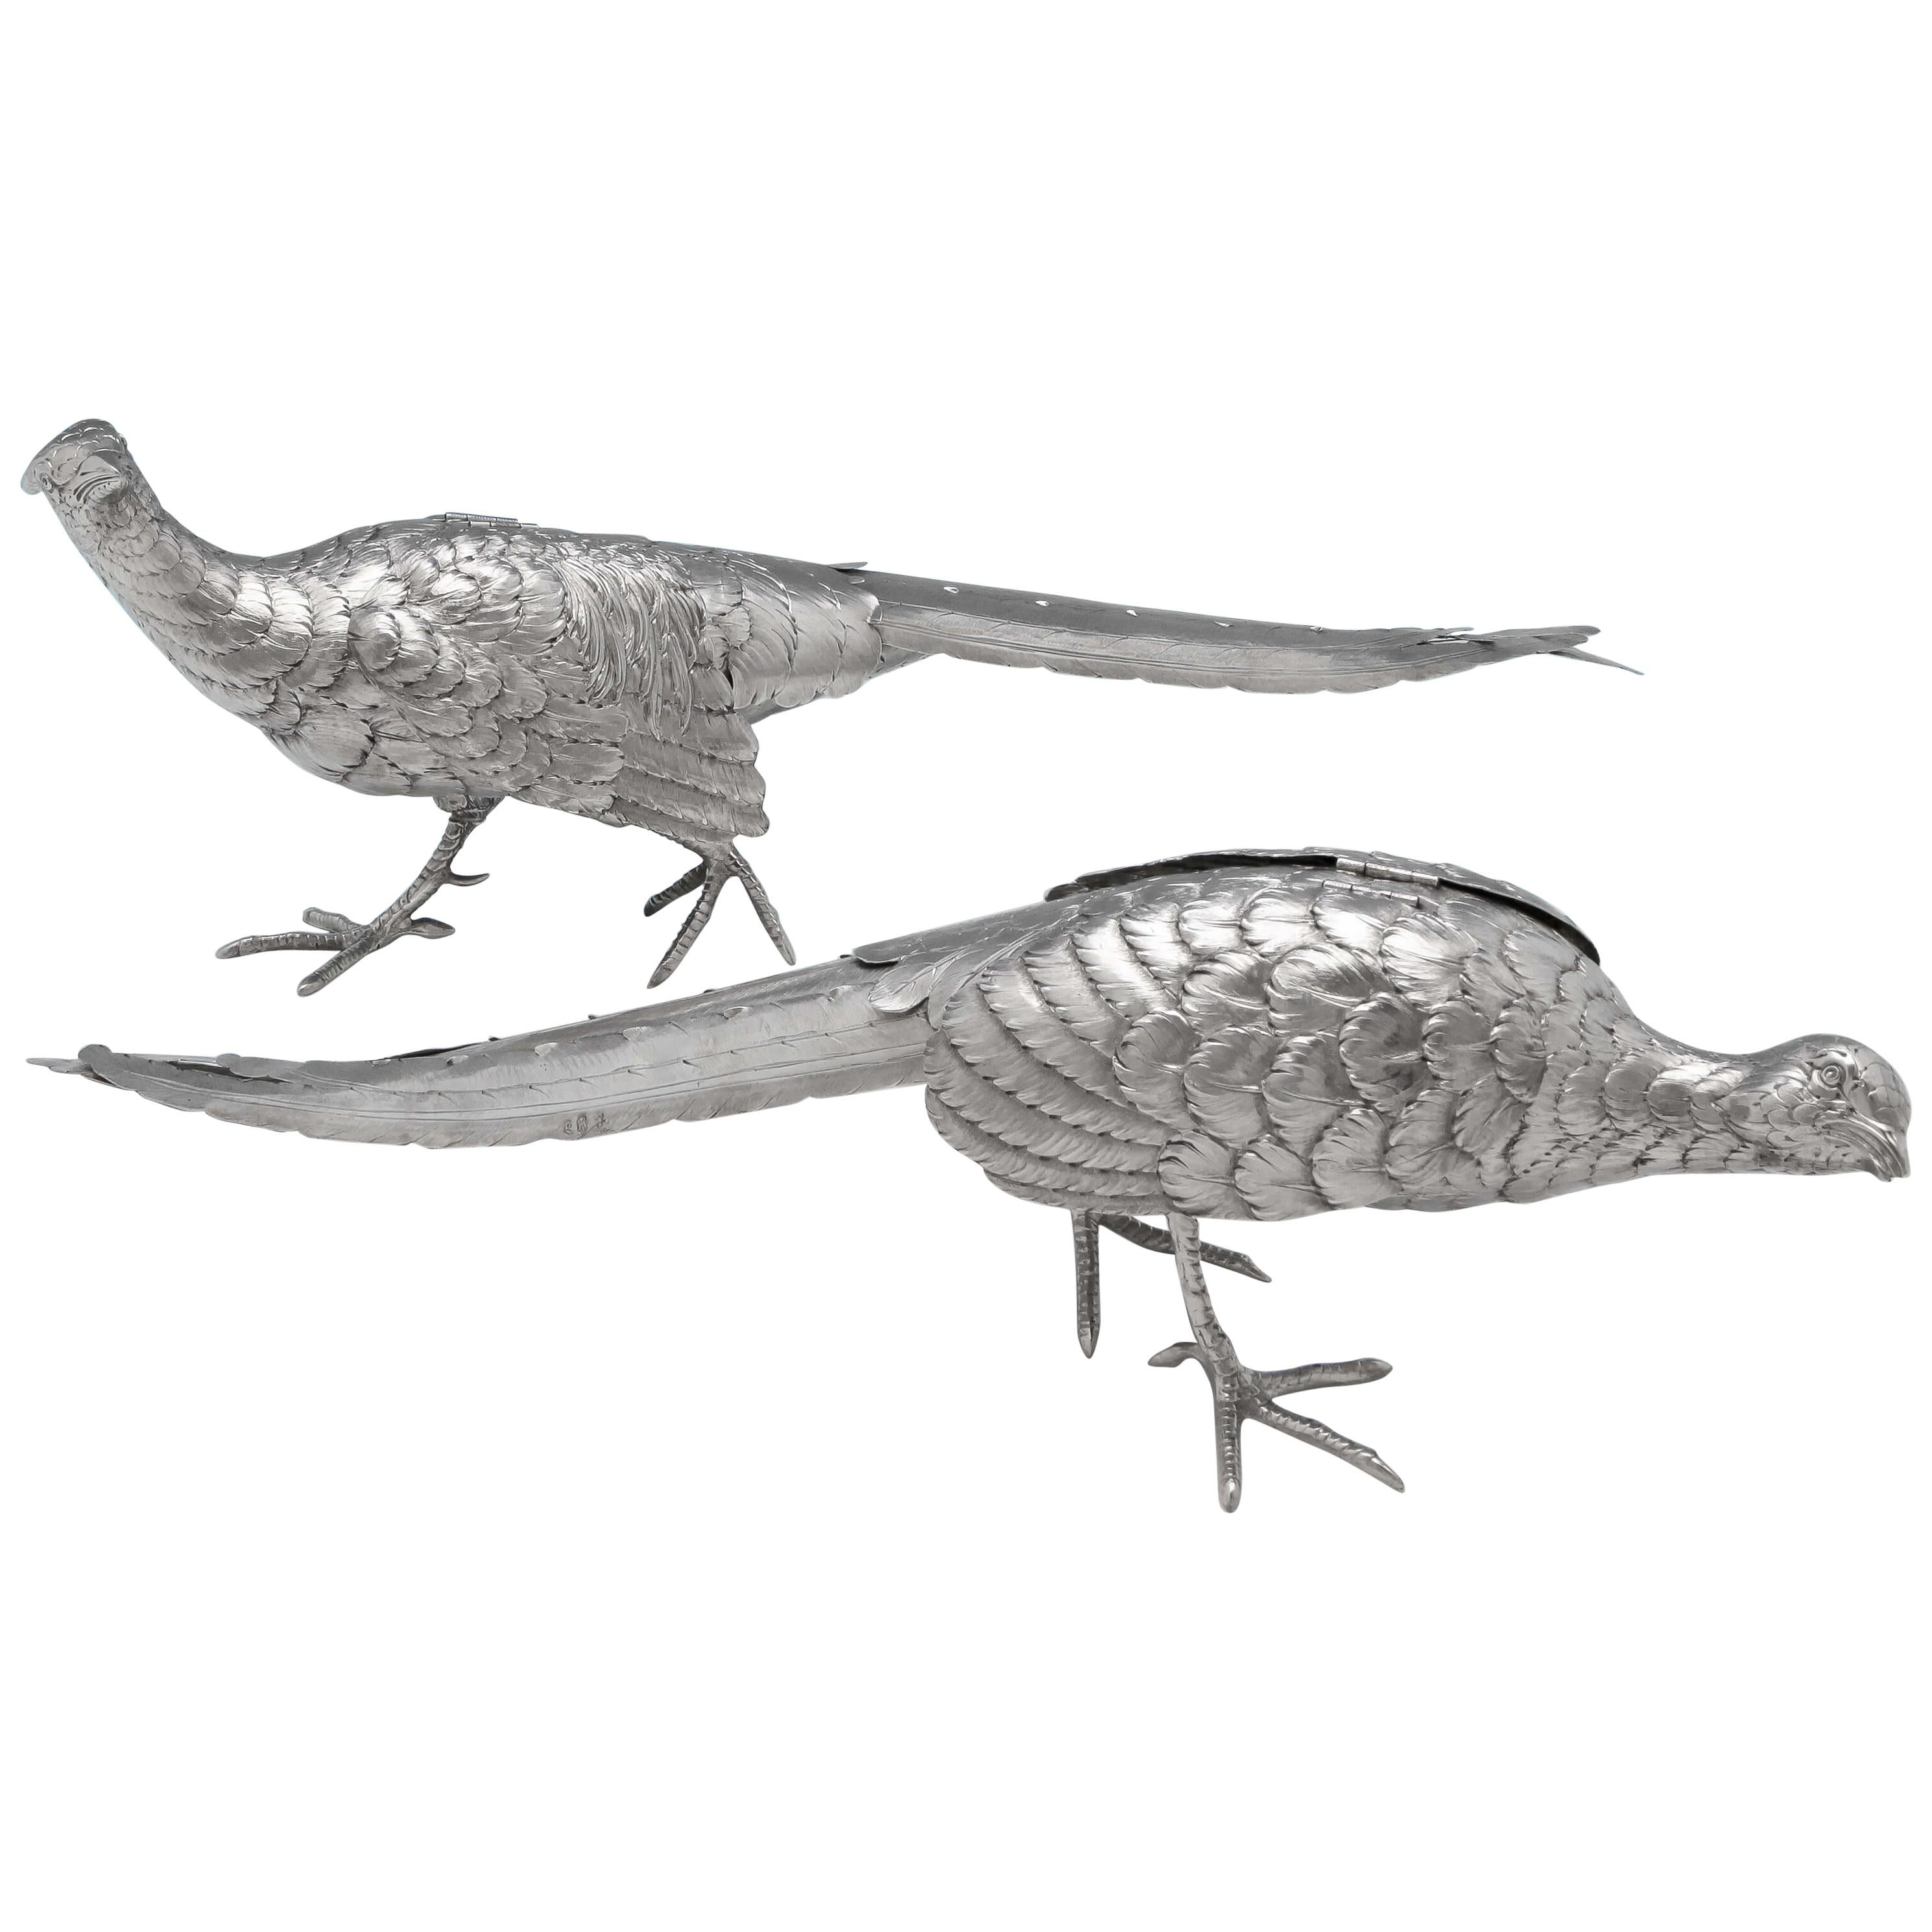 Antique German Silver Pair of Pheasants Made Circa 1900